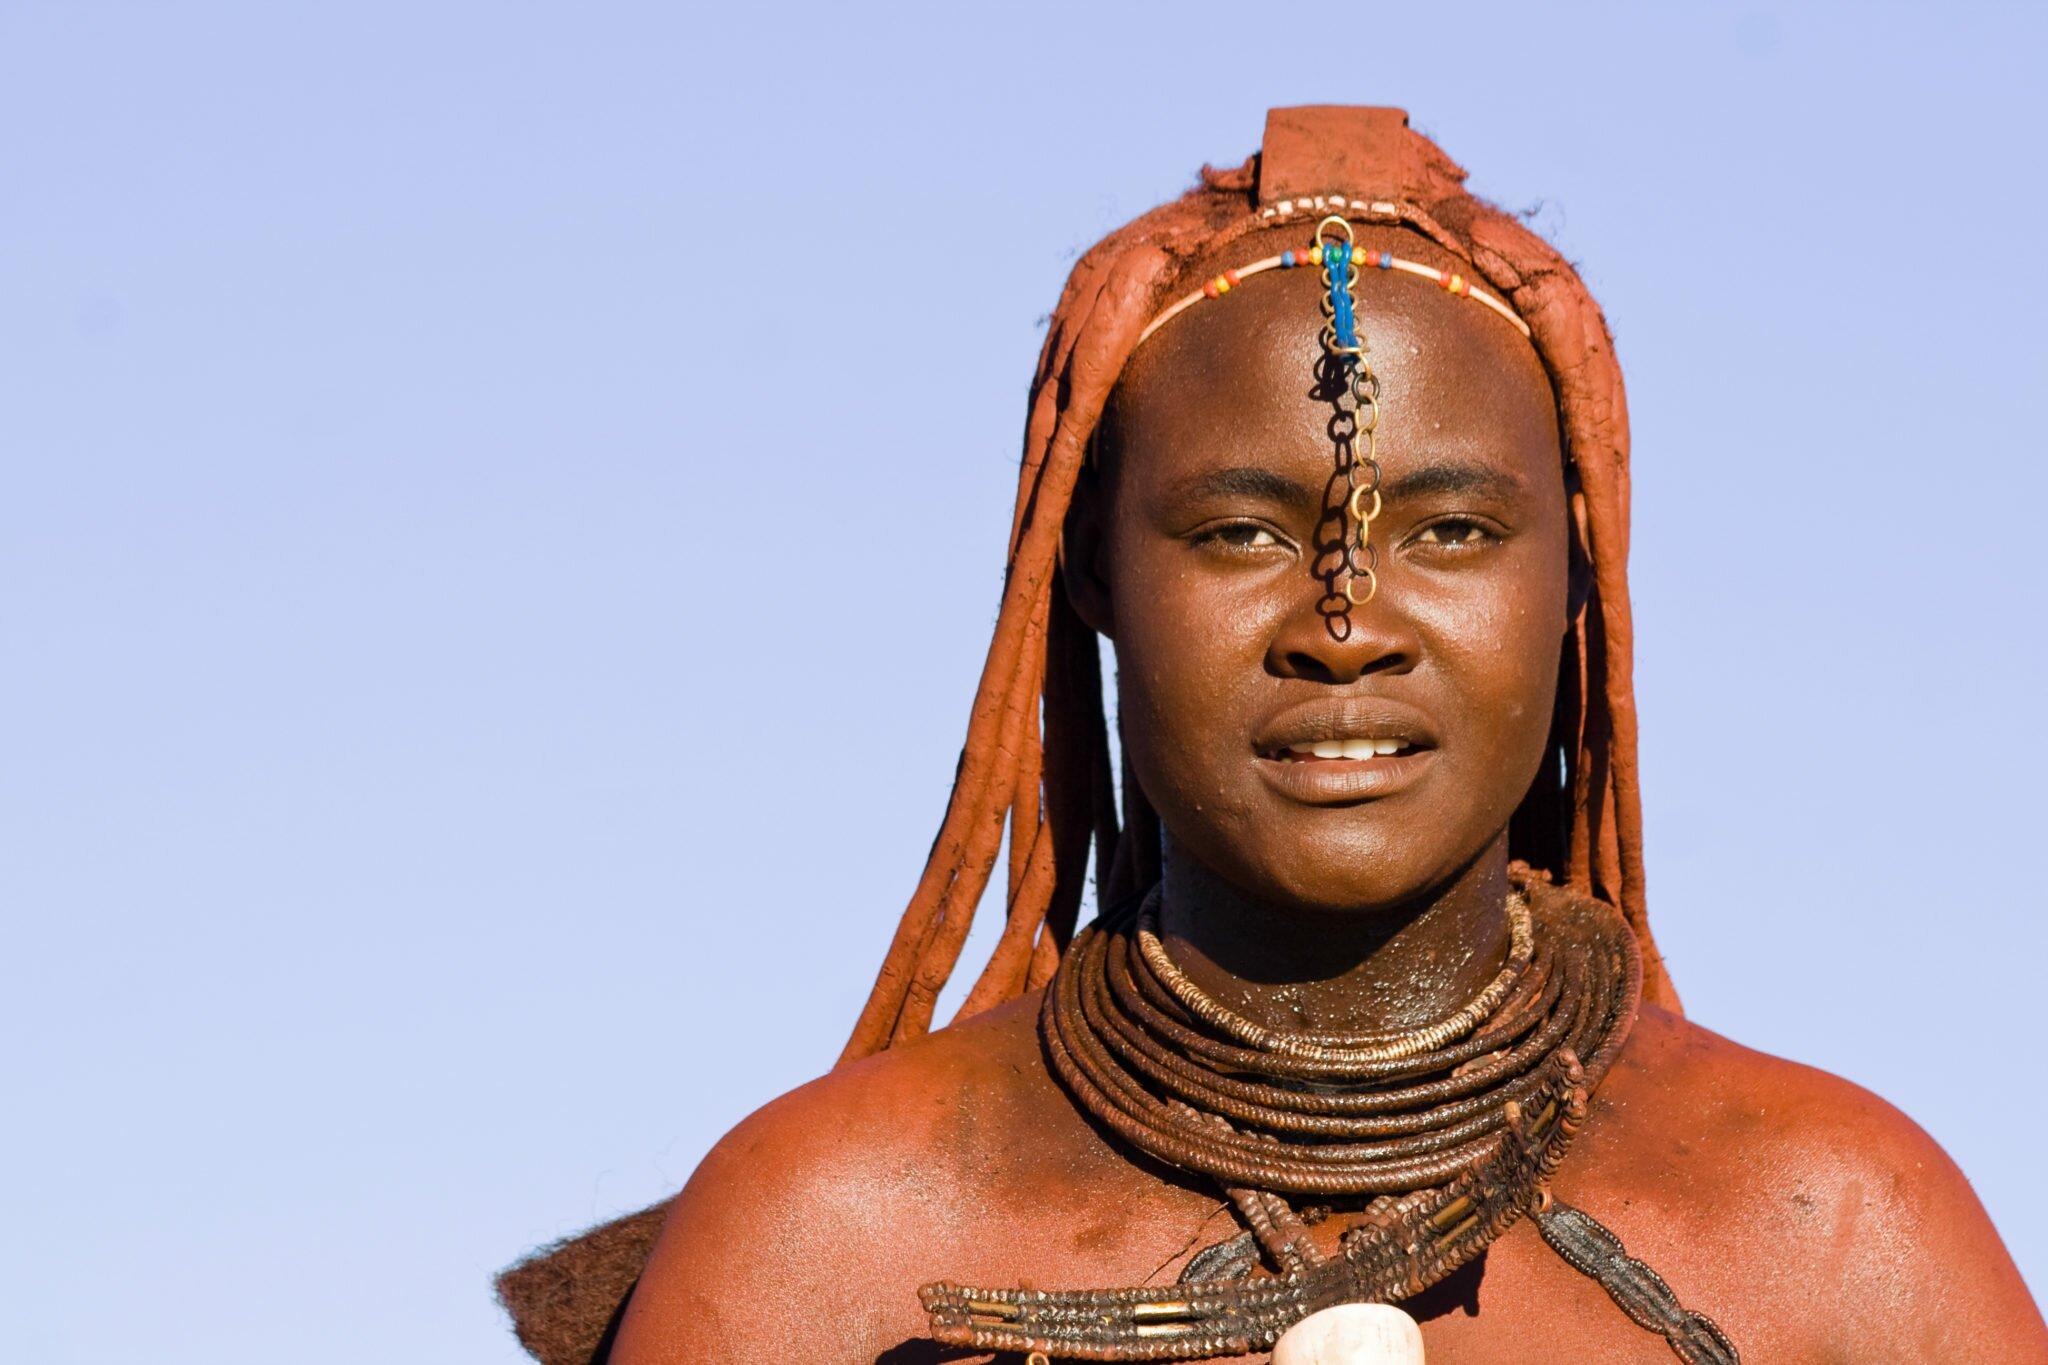 Namibia Himba woman